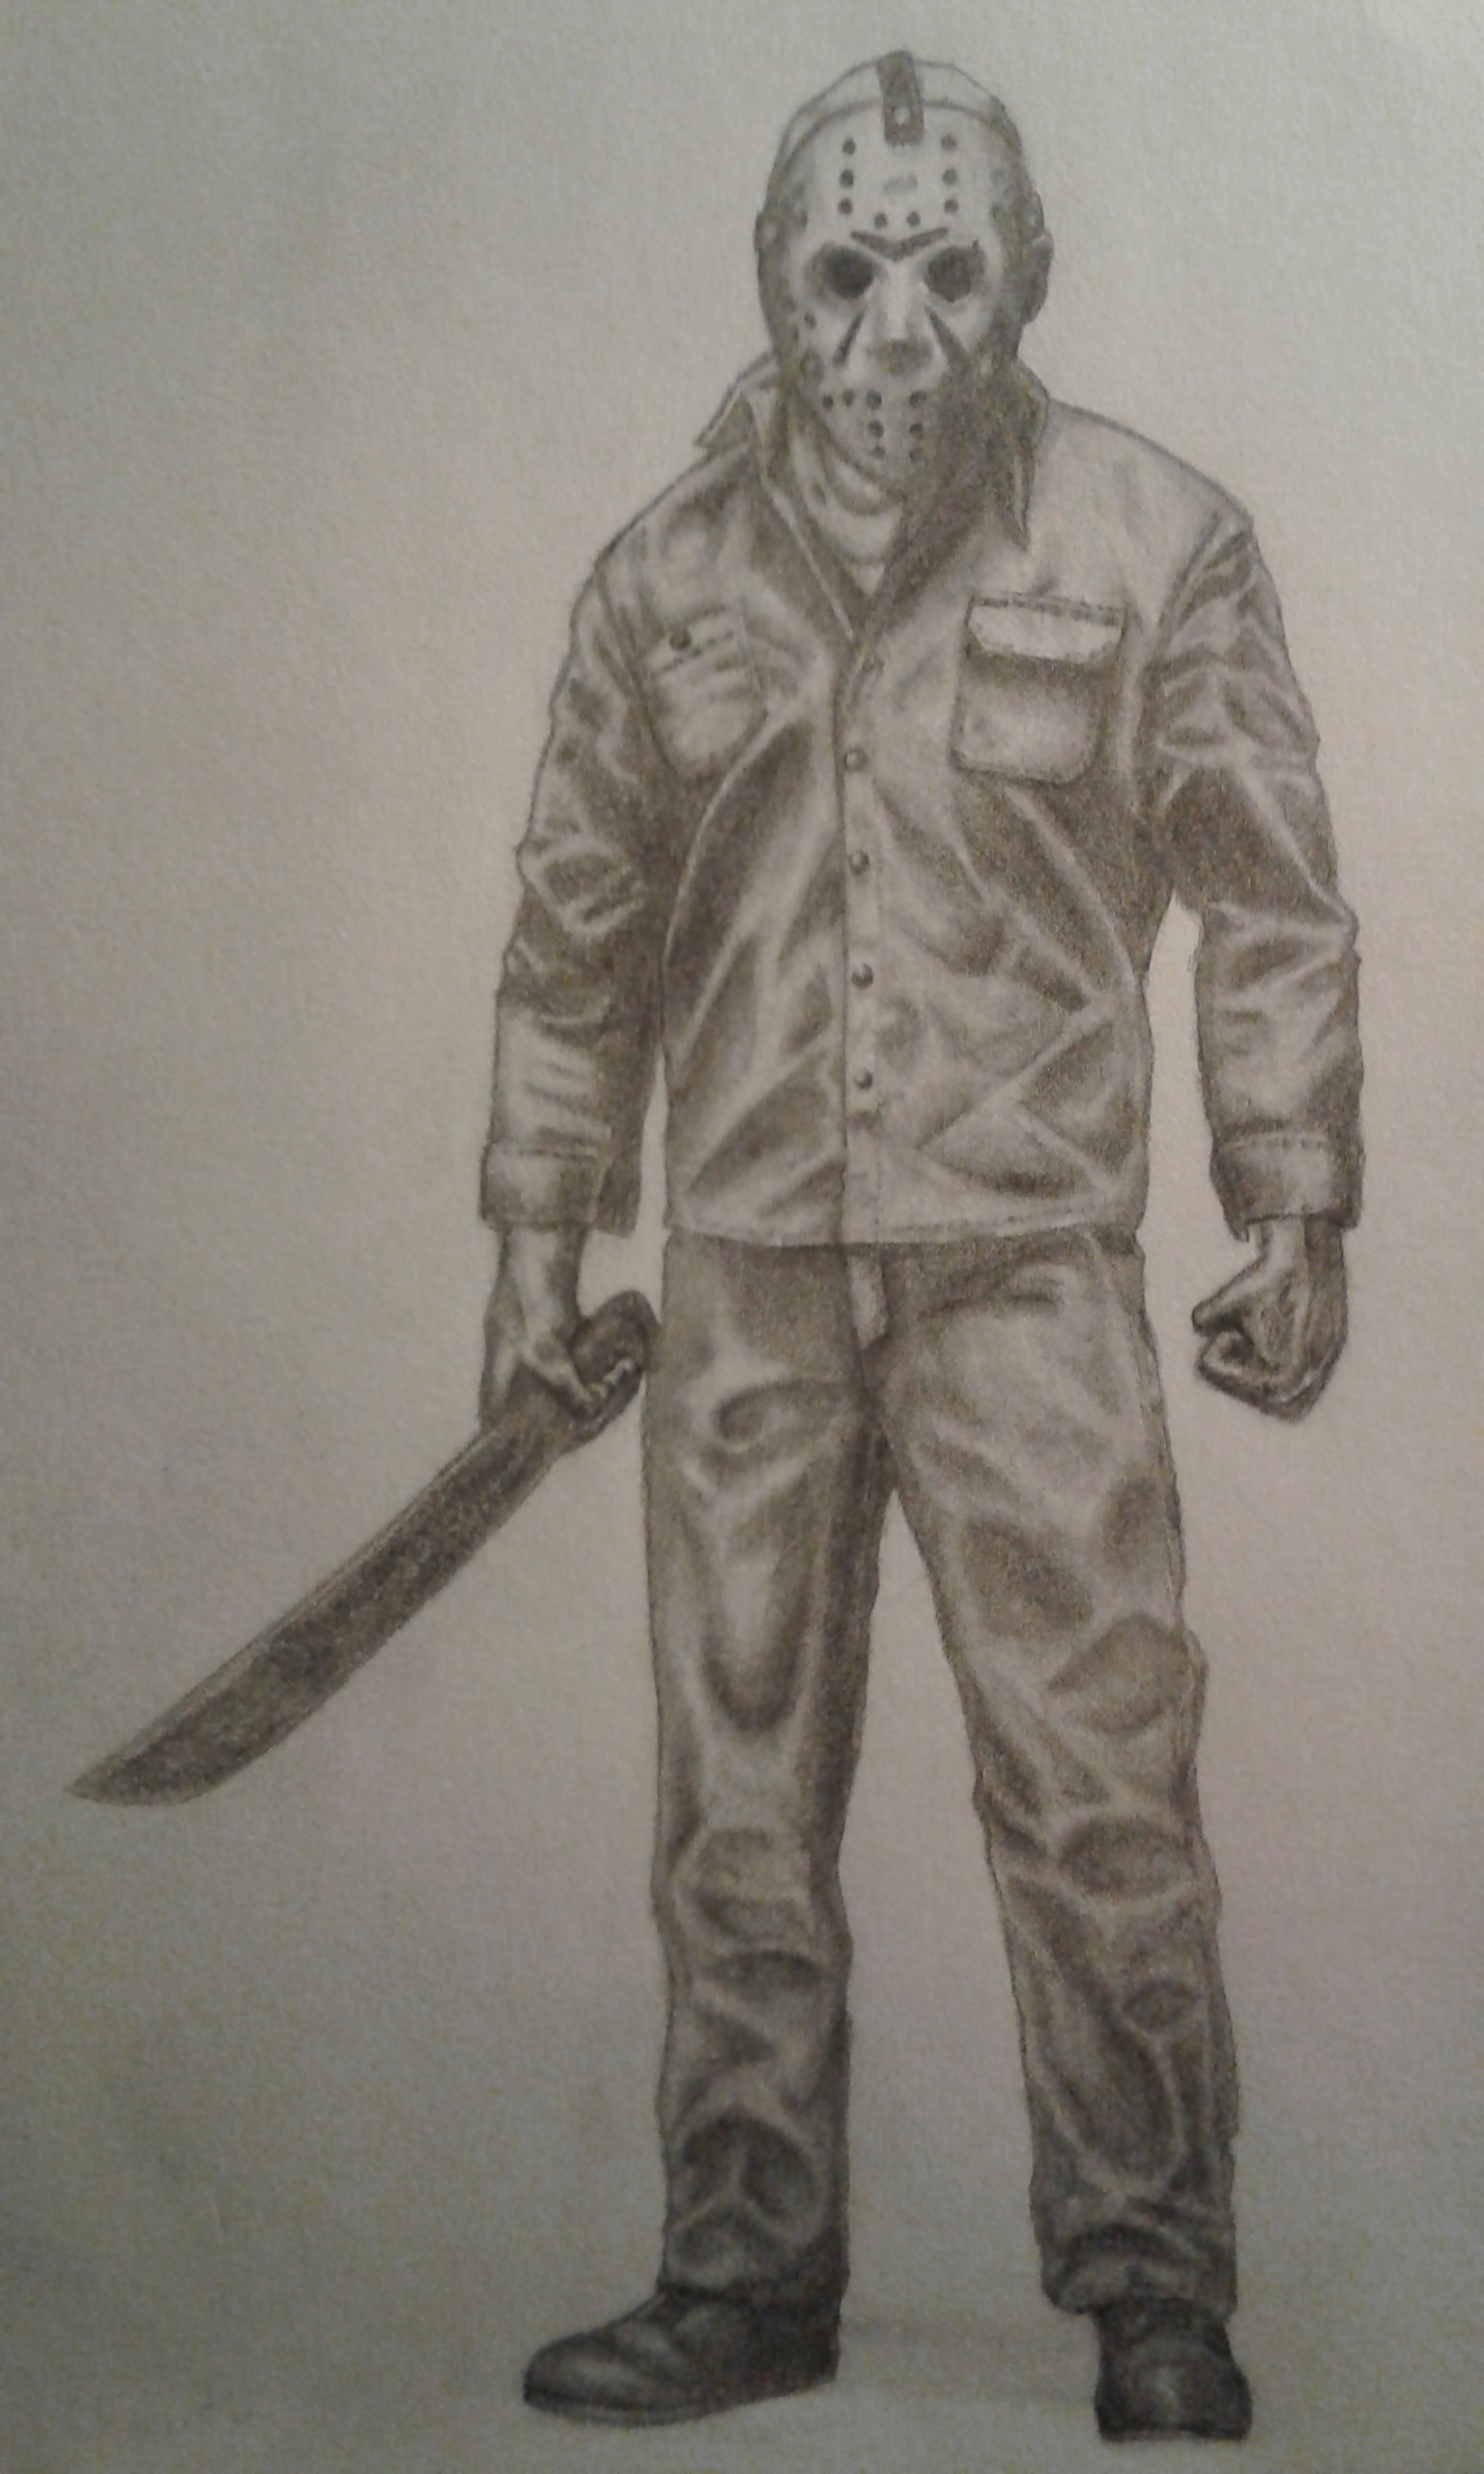 Jason Friday The 13th Drawing : jason, friday, drawing, Chris, Clements, Friday, Jason, Voorhees